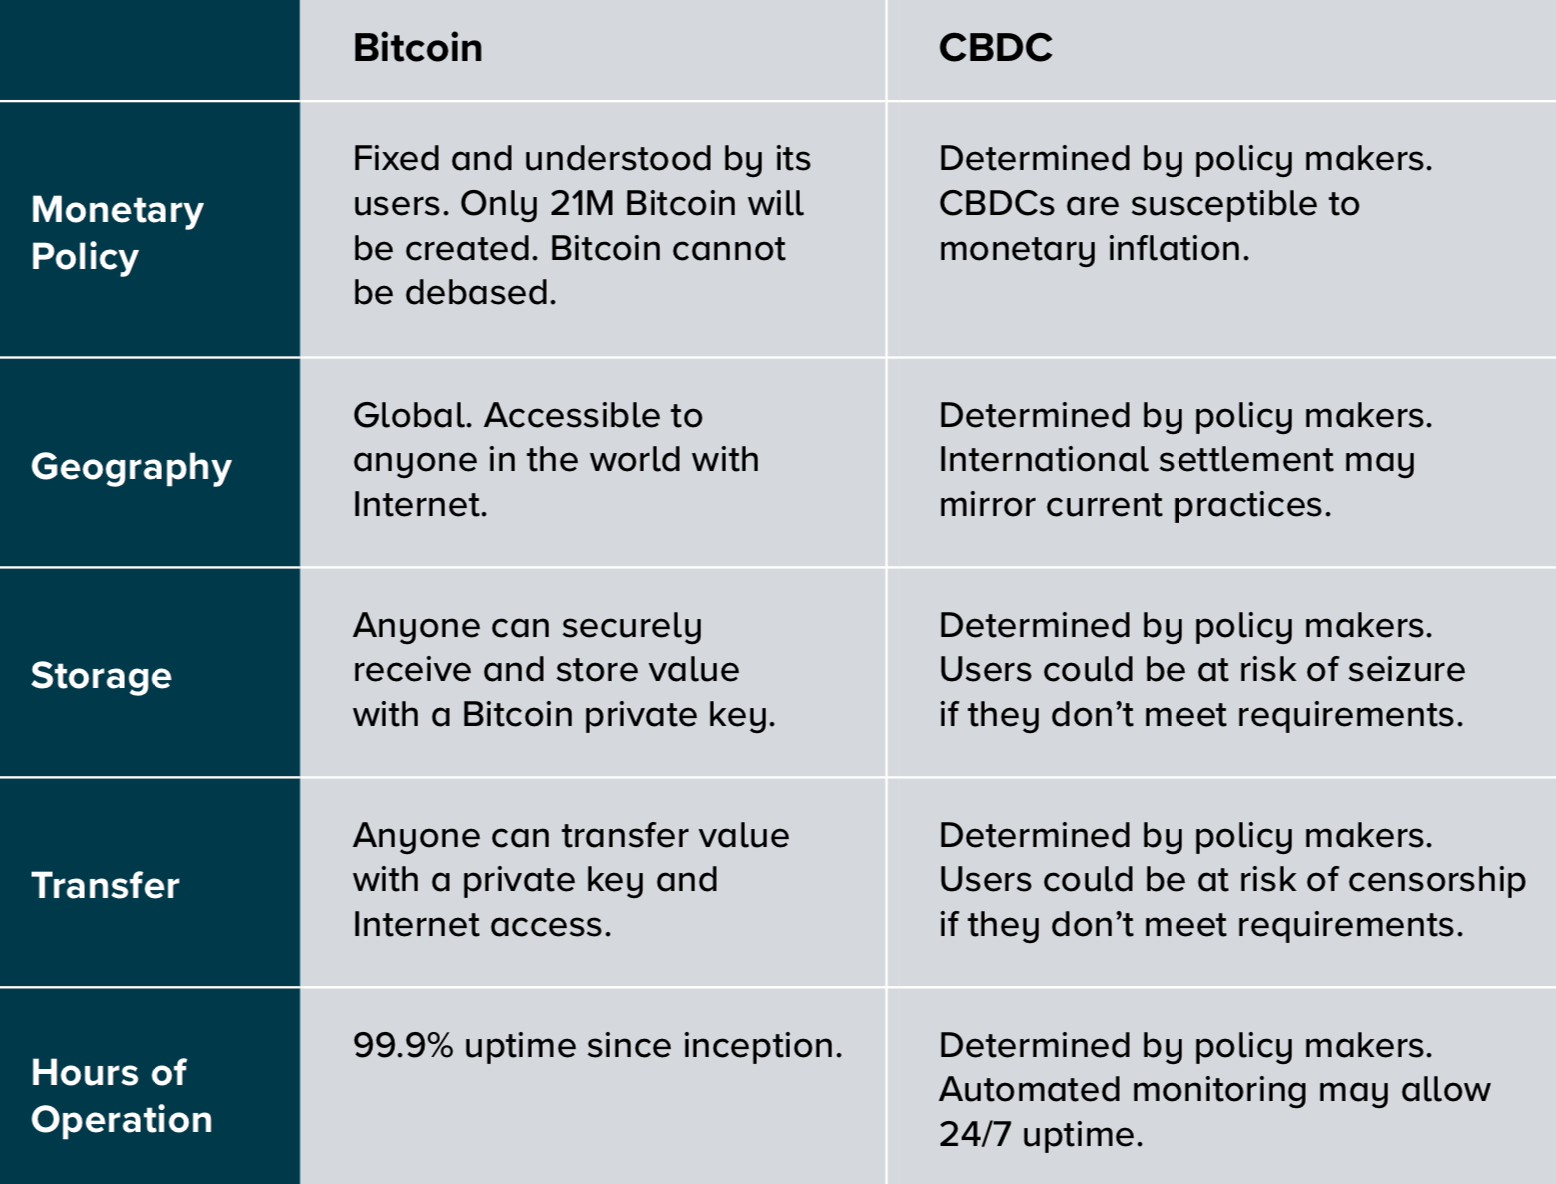 CBDC versus Bitcoin